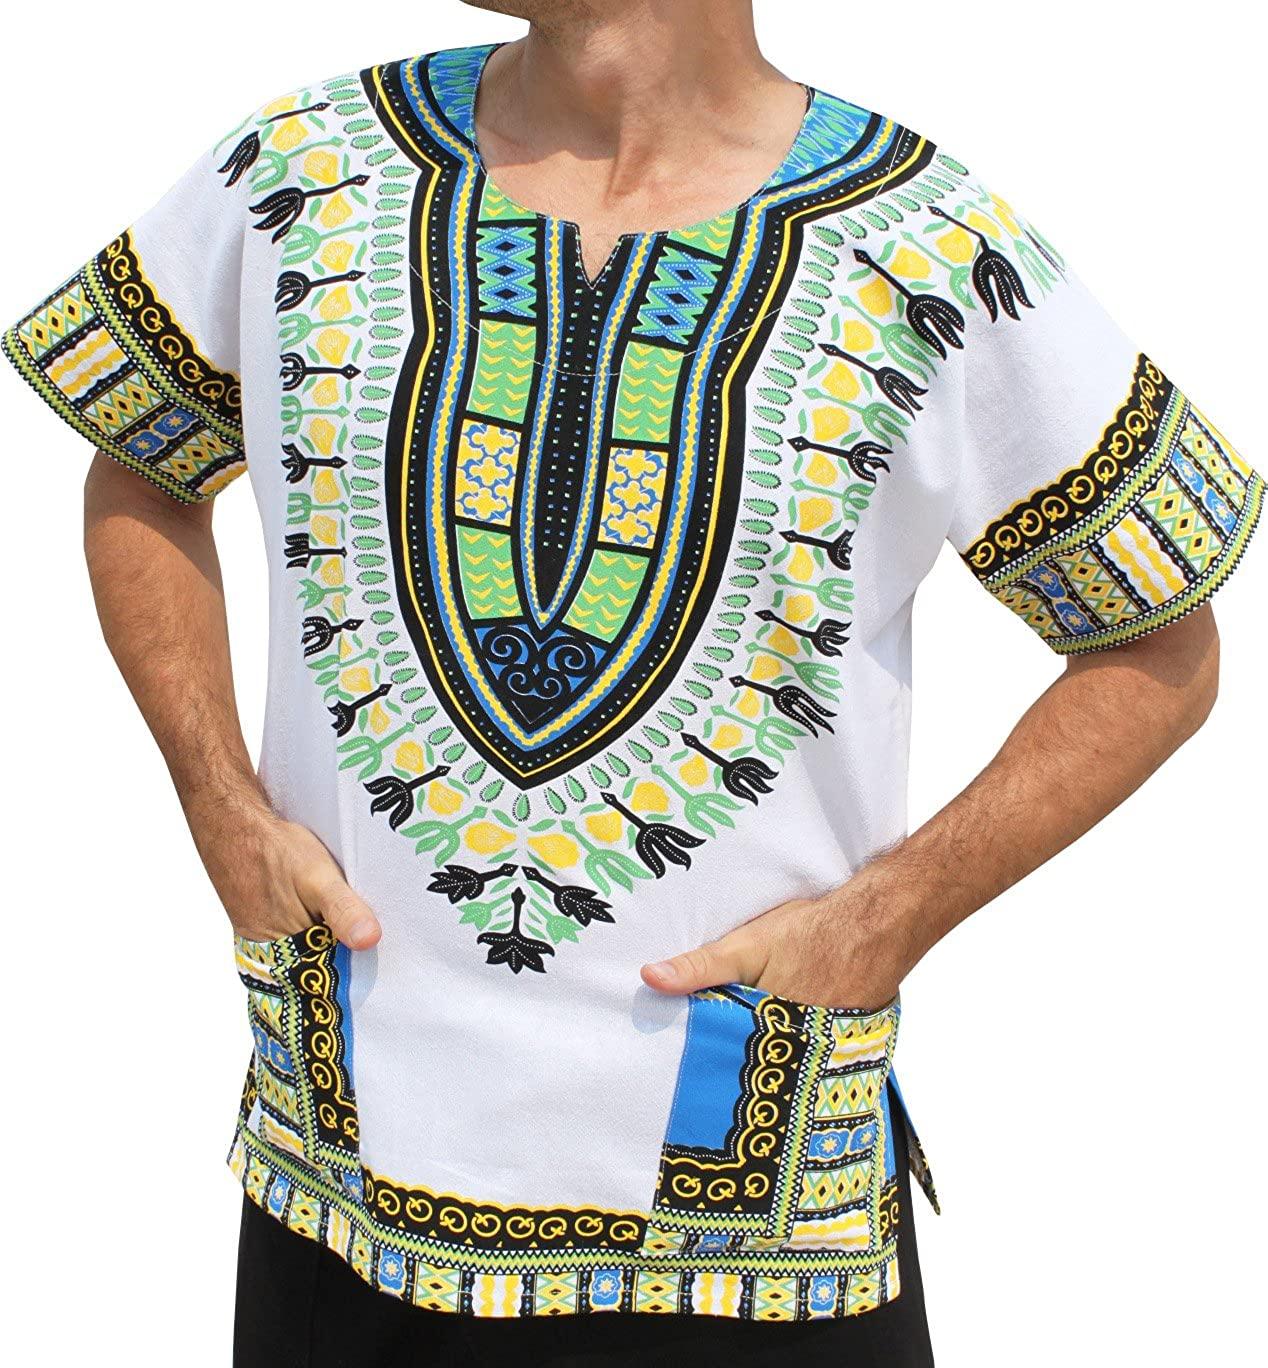 RaanPahMuang Brand Thick Muang Cotton Print African Dashiki Shirt Africa Plus